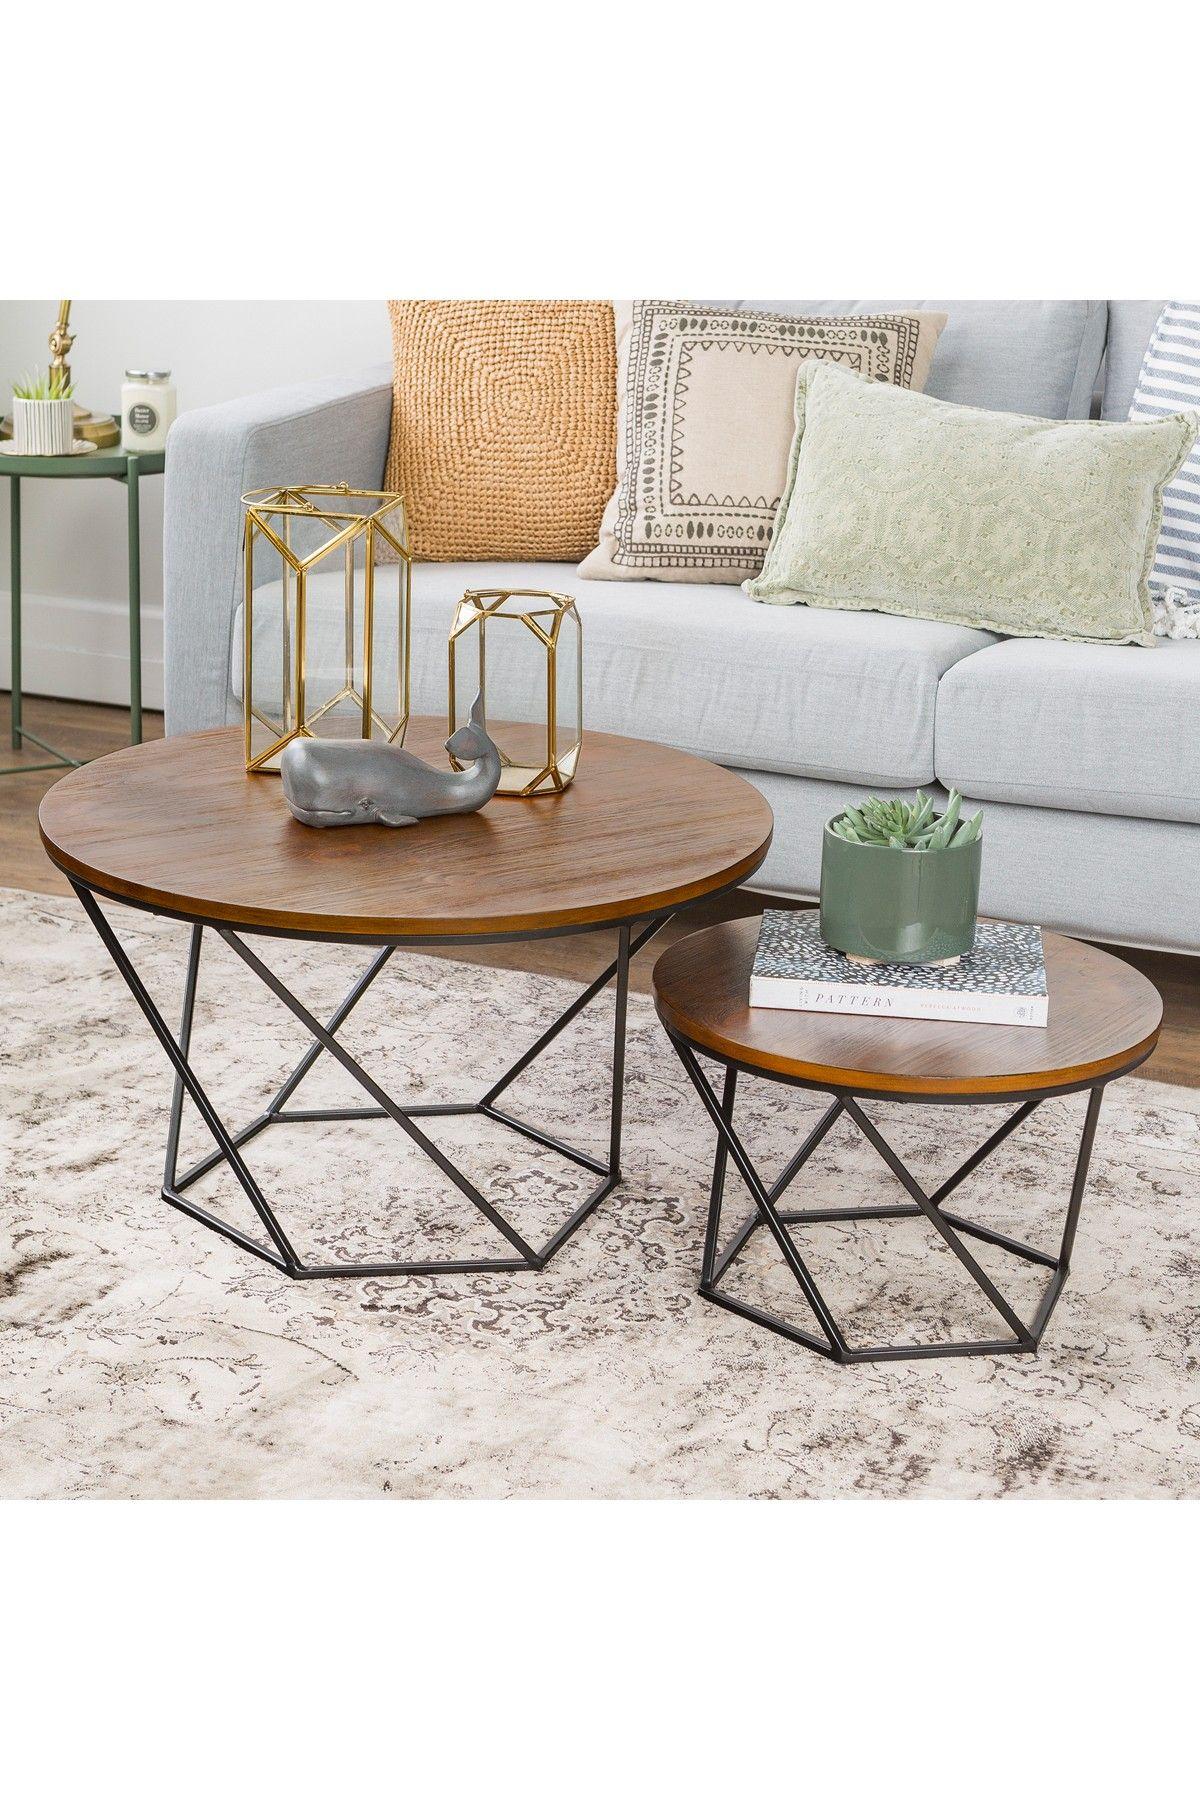 Walker Edison Furniture Company Oak Black Geometric Wood Nesting Coffee Tables Nesting Coffee Tables Geometric Coffee Table Coffee Table [ 1800 x 1200 Pixel ]